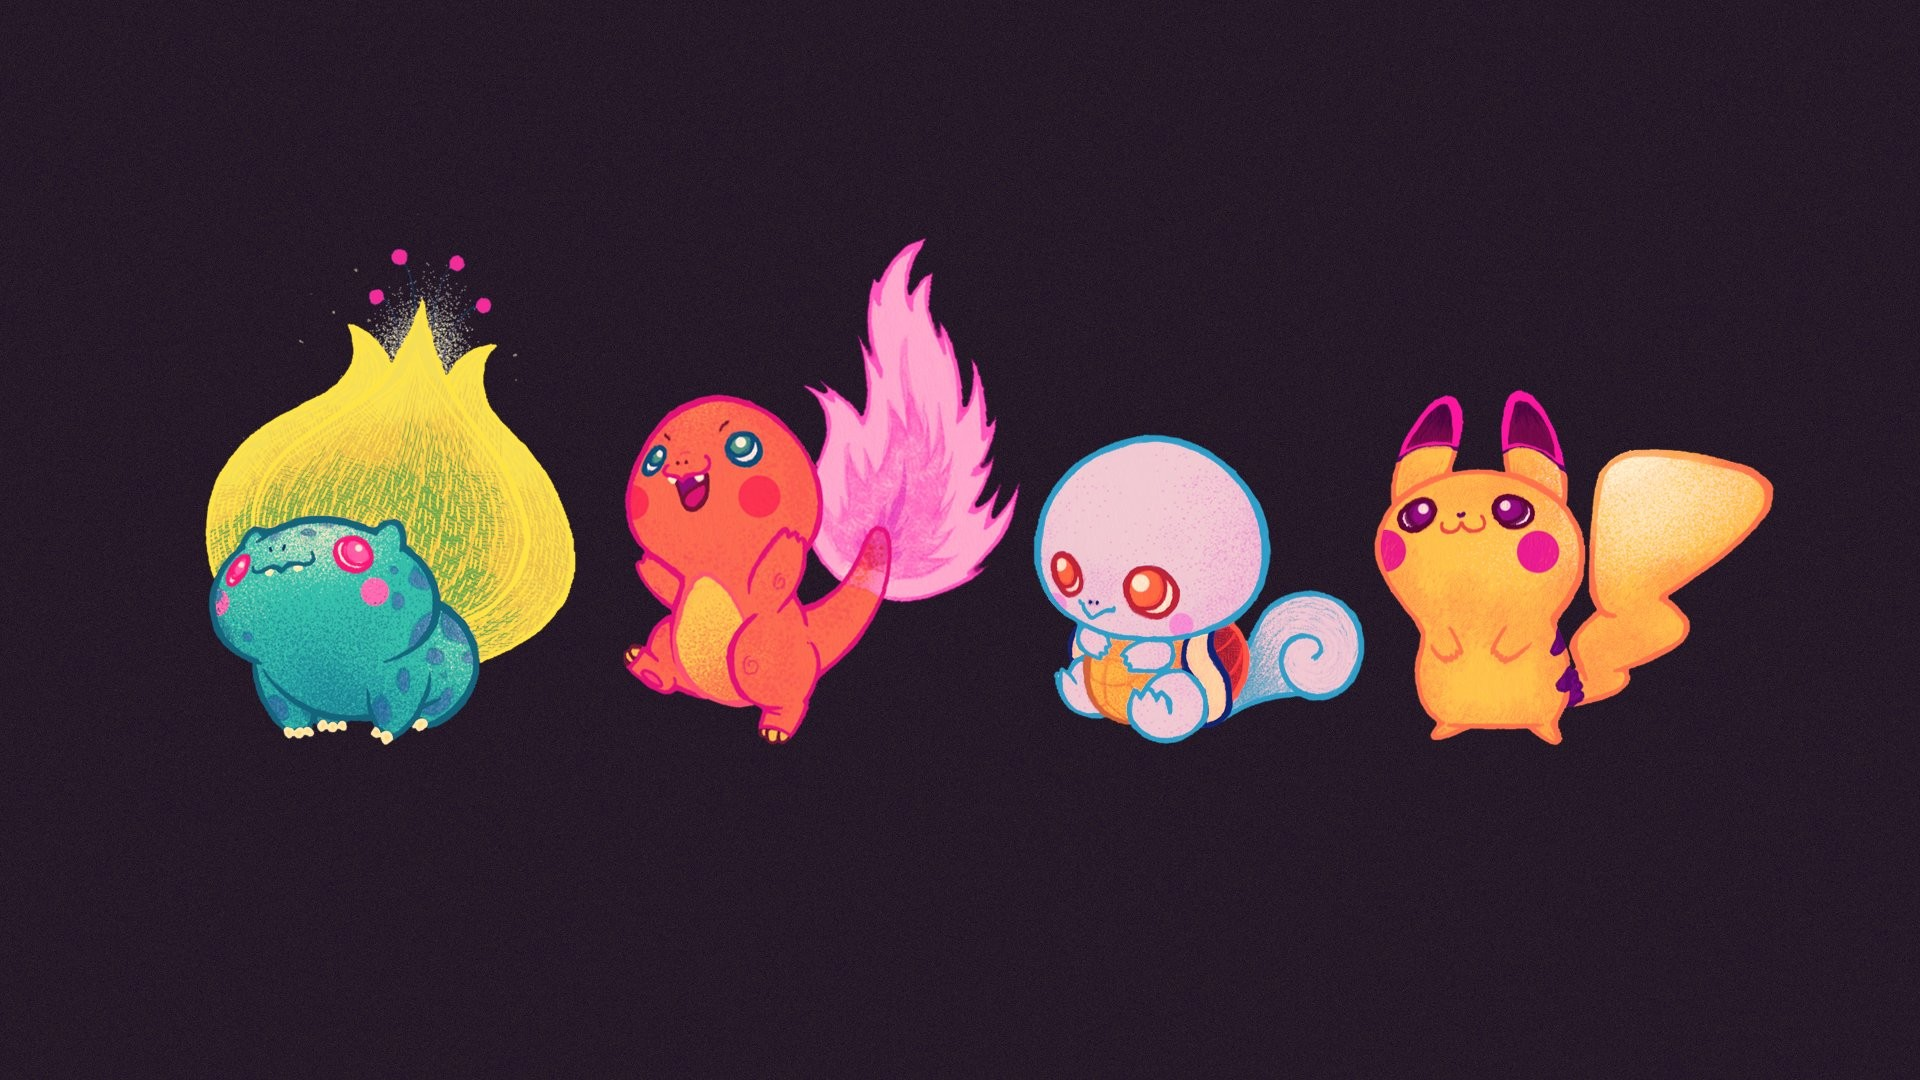 Neon Pokemon Wallpaper